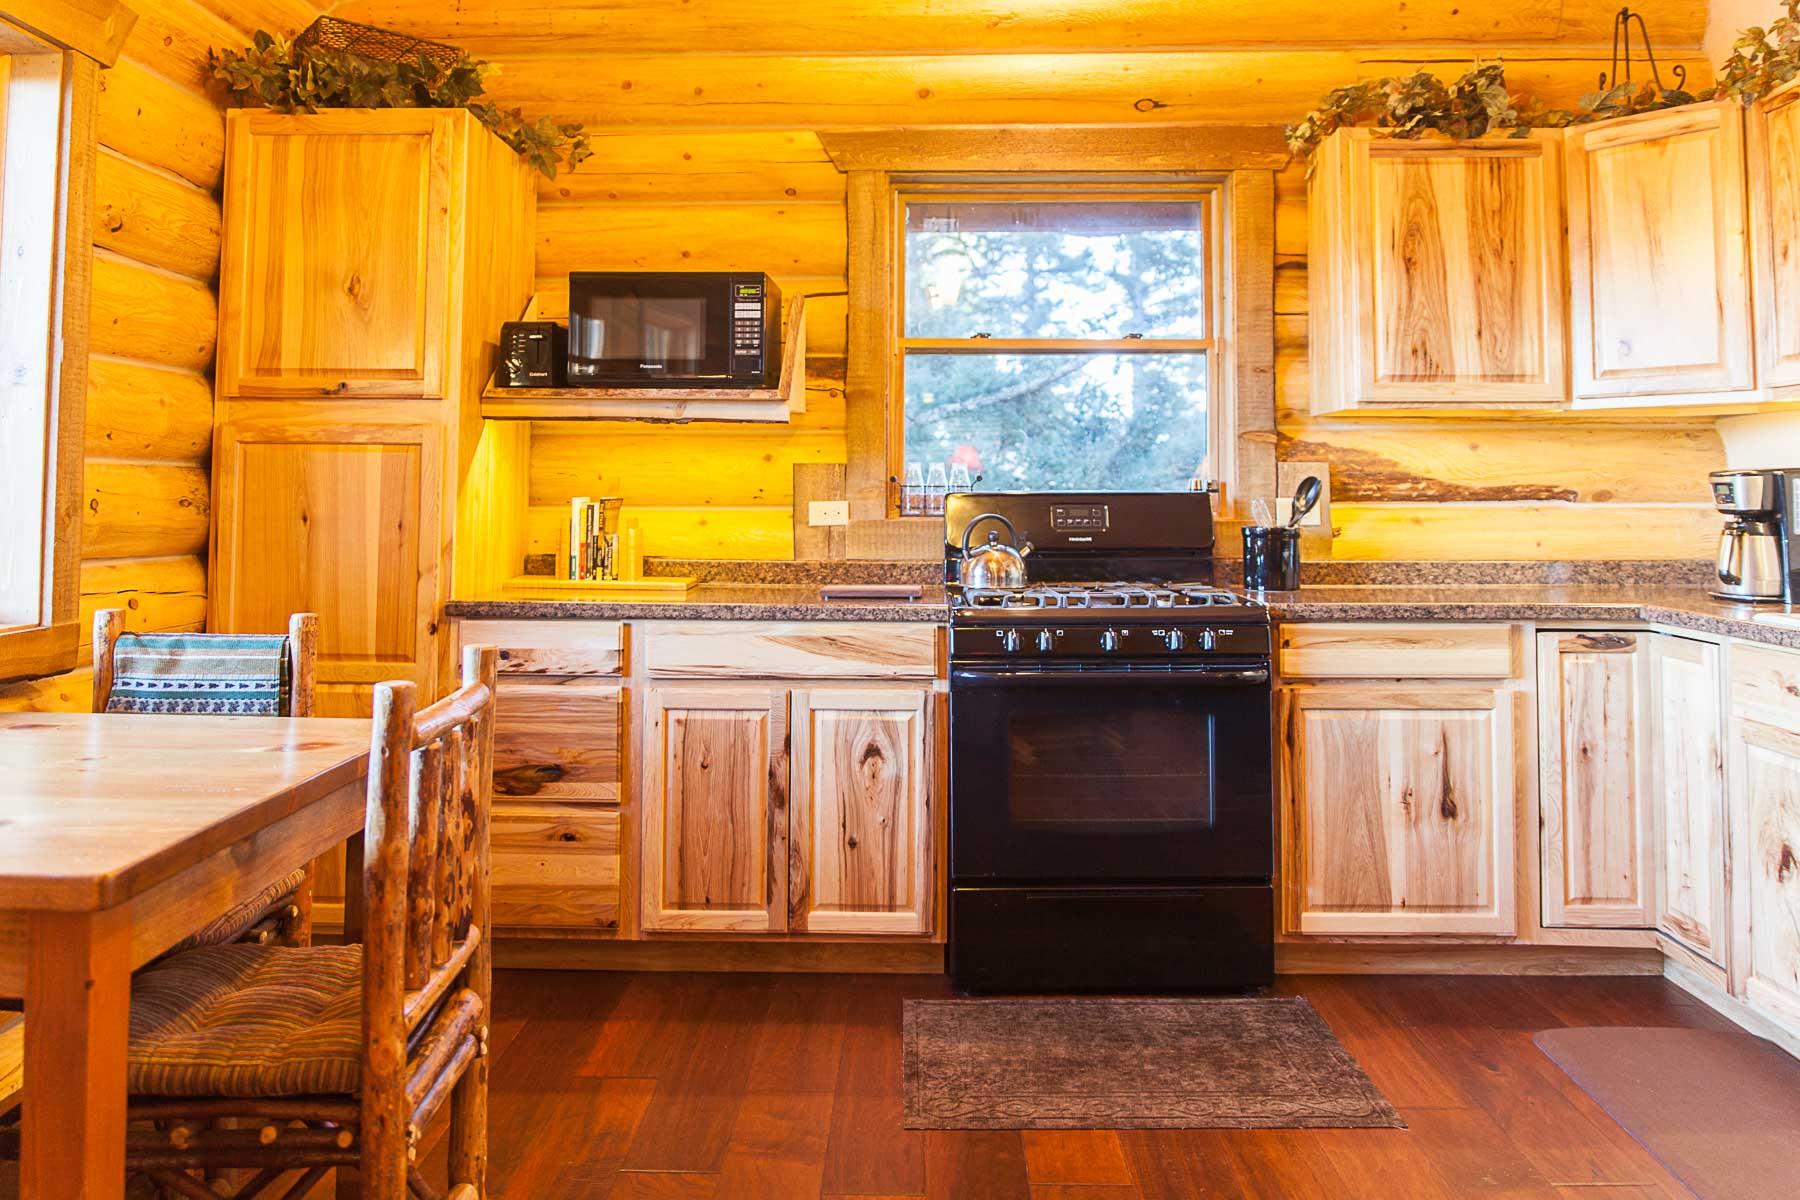 casita log home kit colorado new mexico-4.jpg